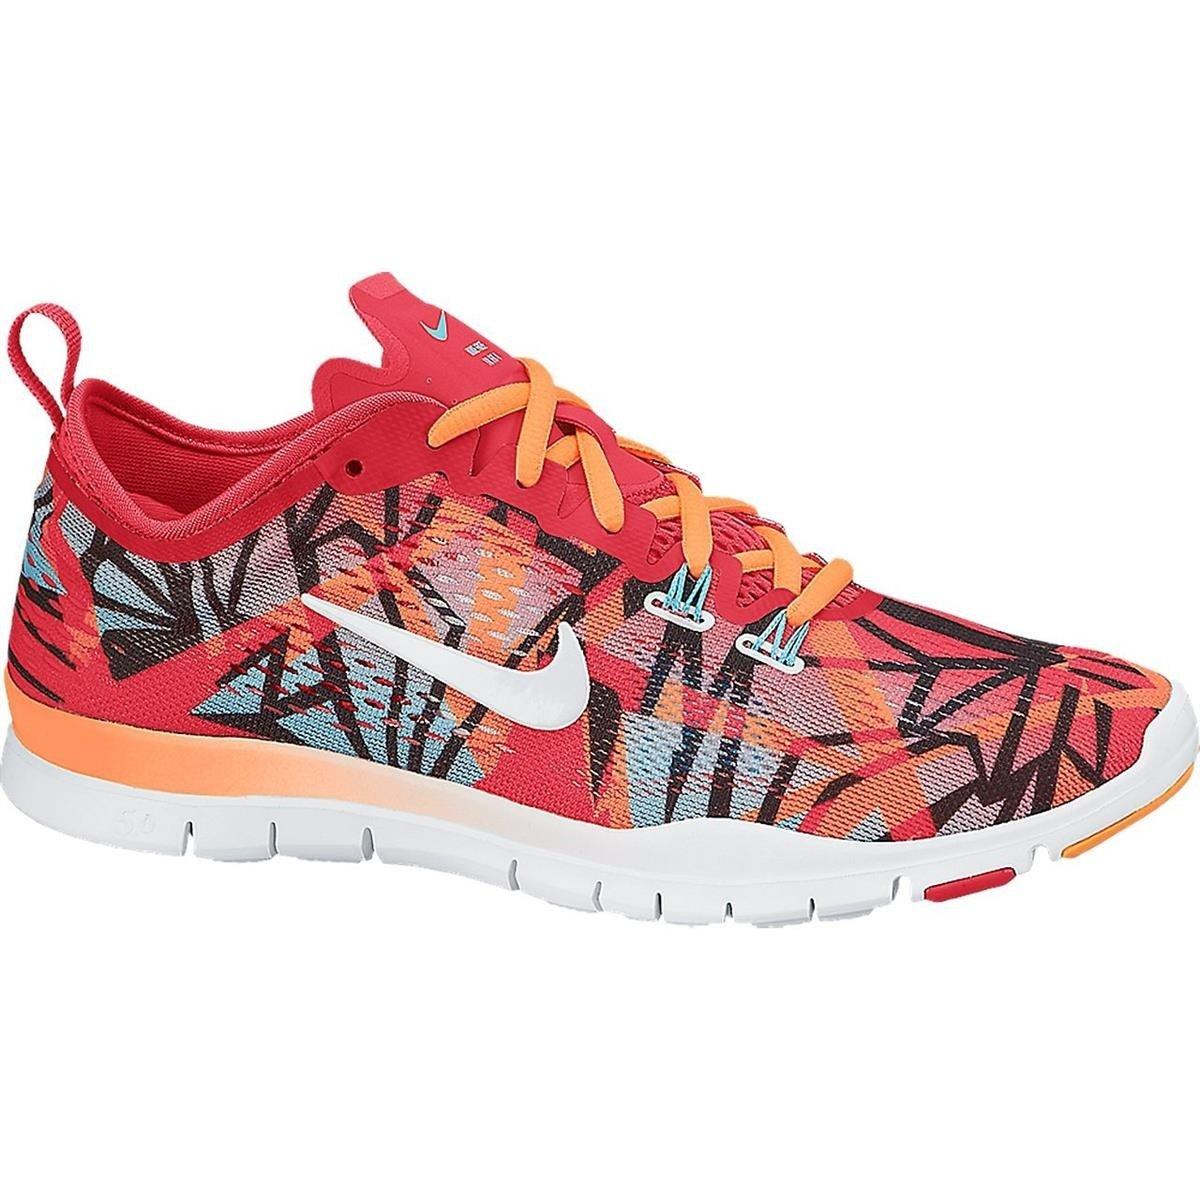 Nike Schuhe Damen Damen Free 5.0 tr fit 4 prt Grnm Weiß-plrzd bl-atmc orng